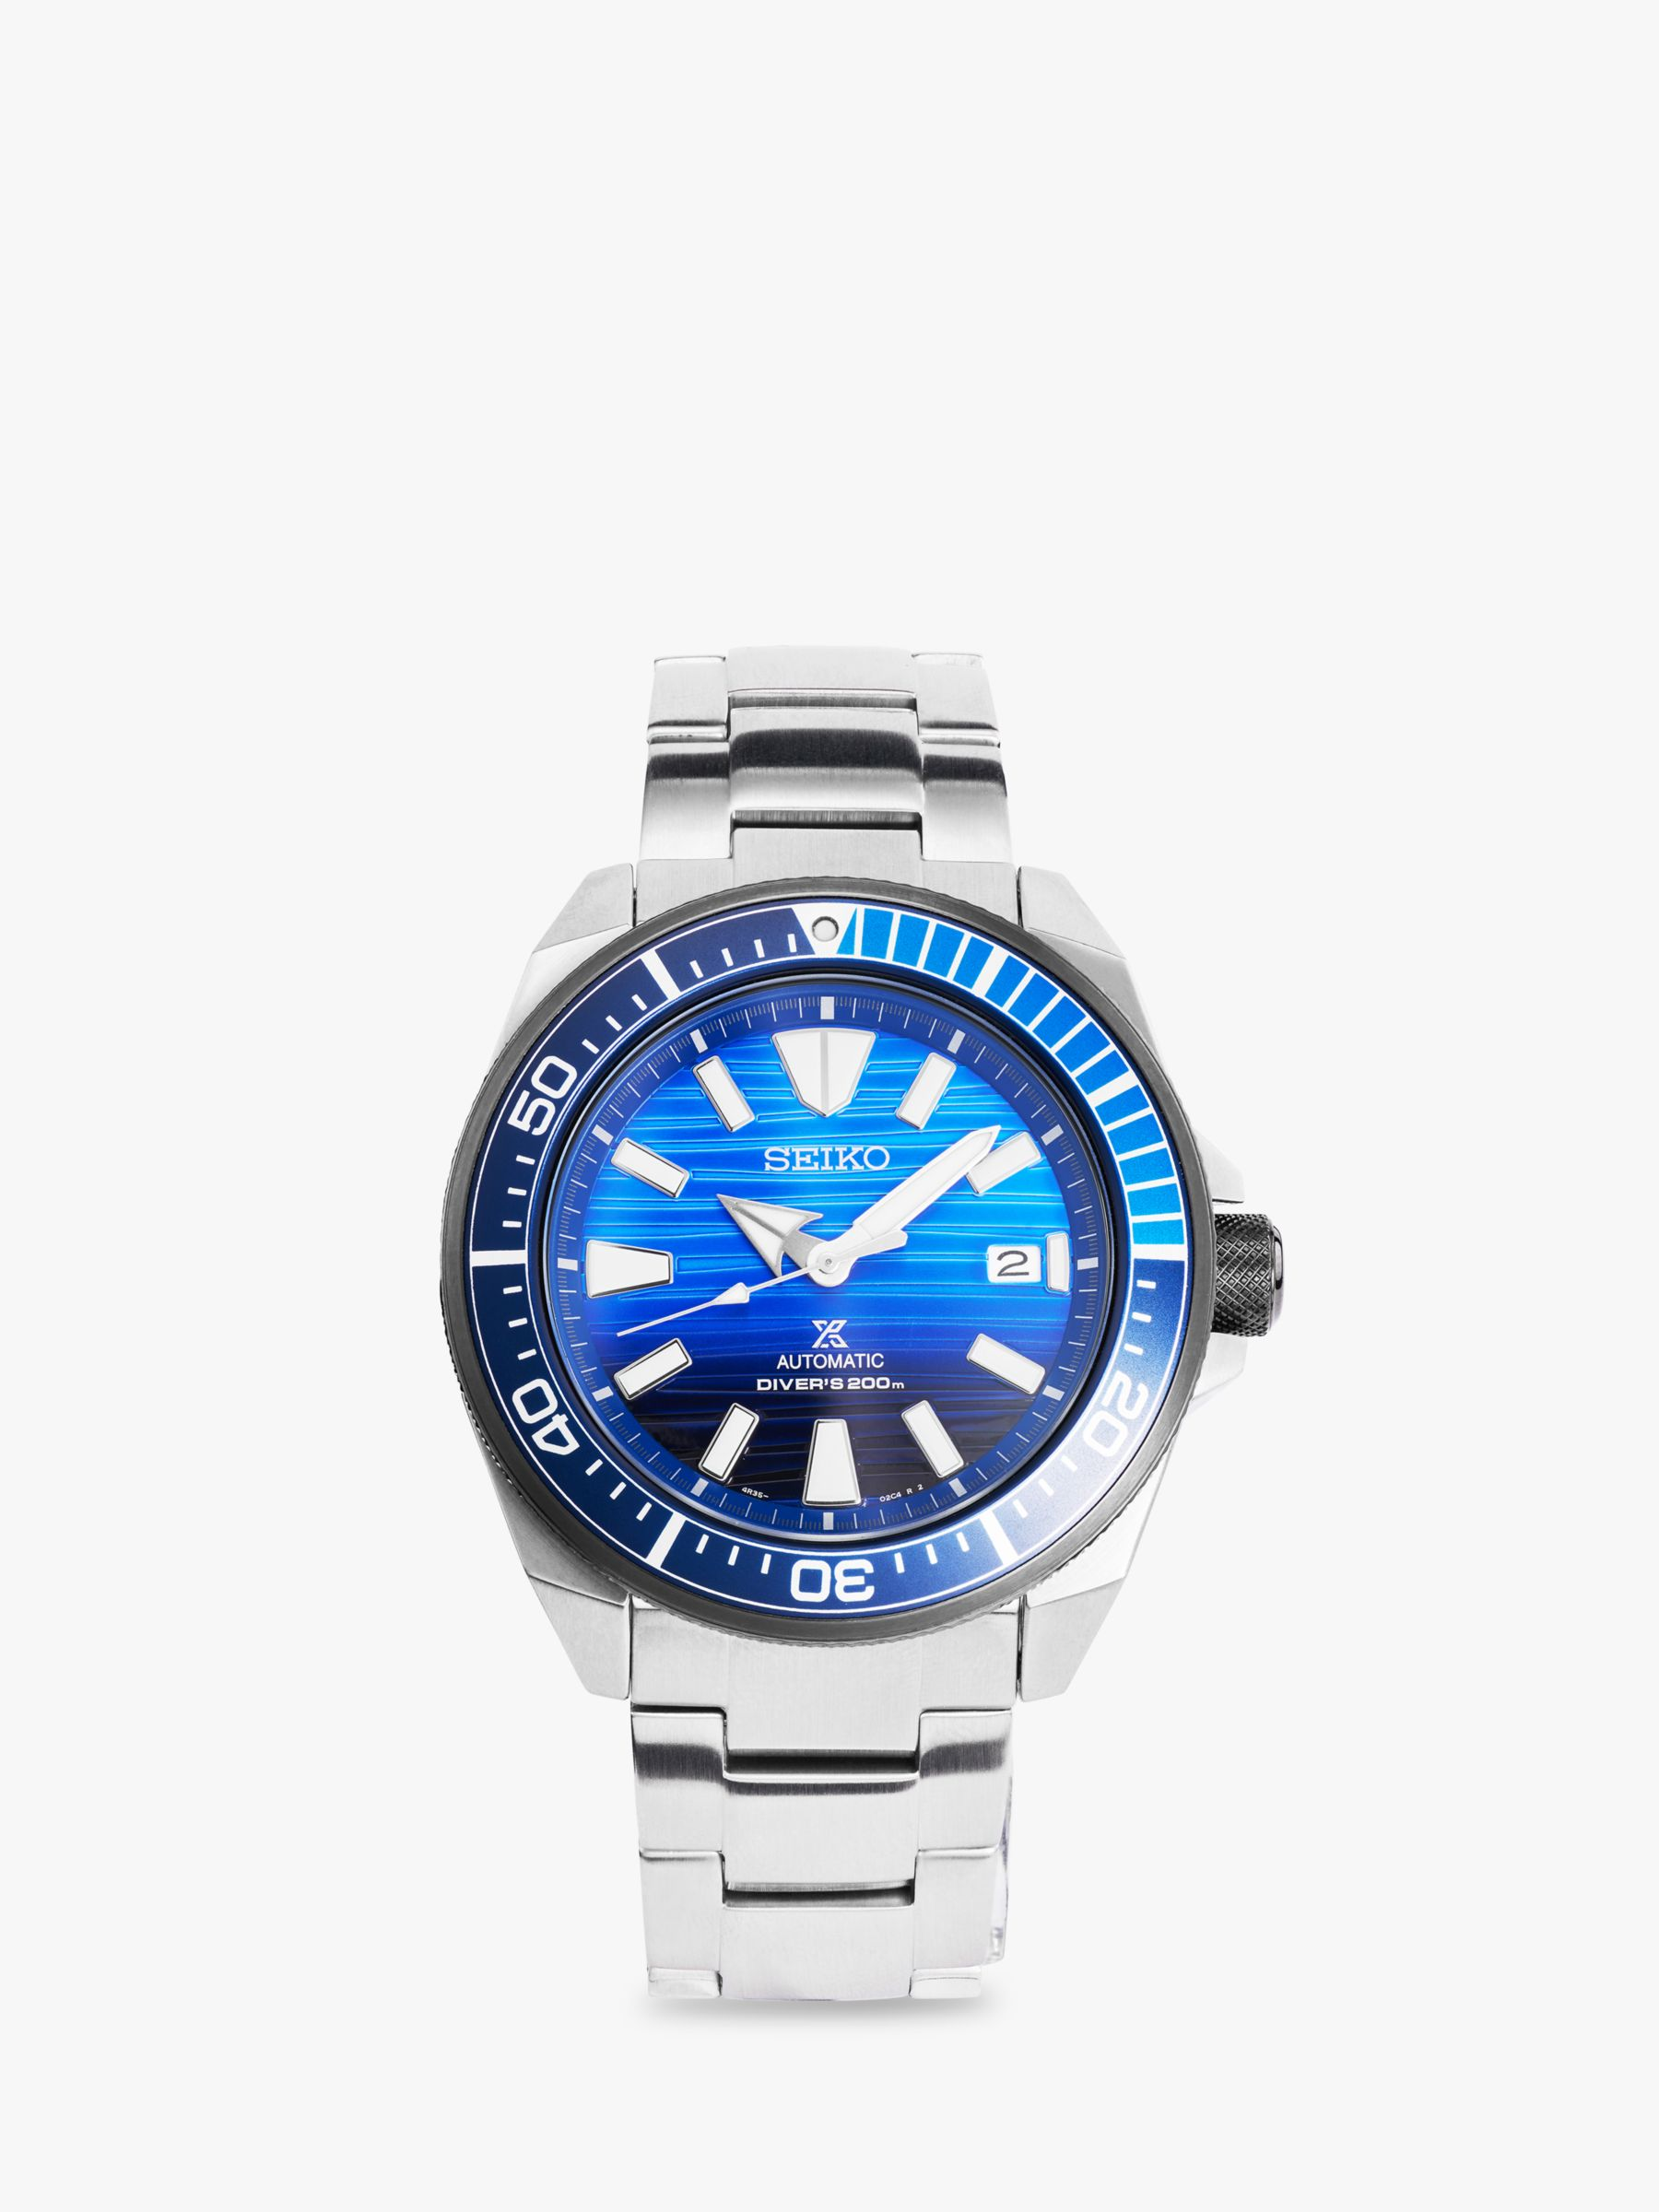 Seiko Seiko SRPC93K1 Men's Prospex Date Automatic Bracelet Strap Watch, Silver/Blue